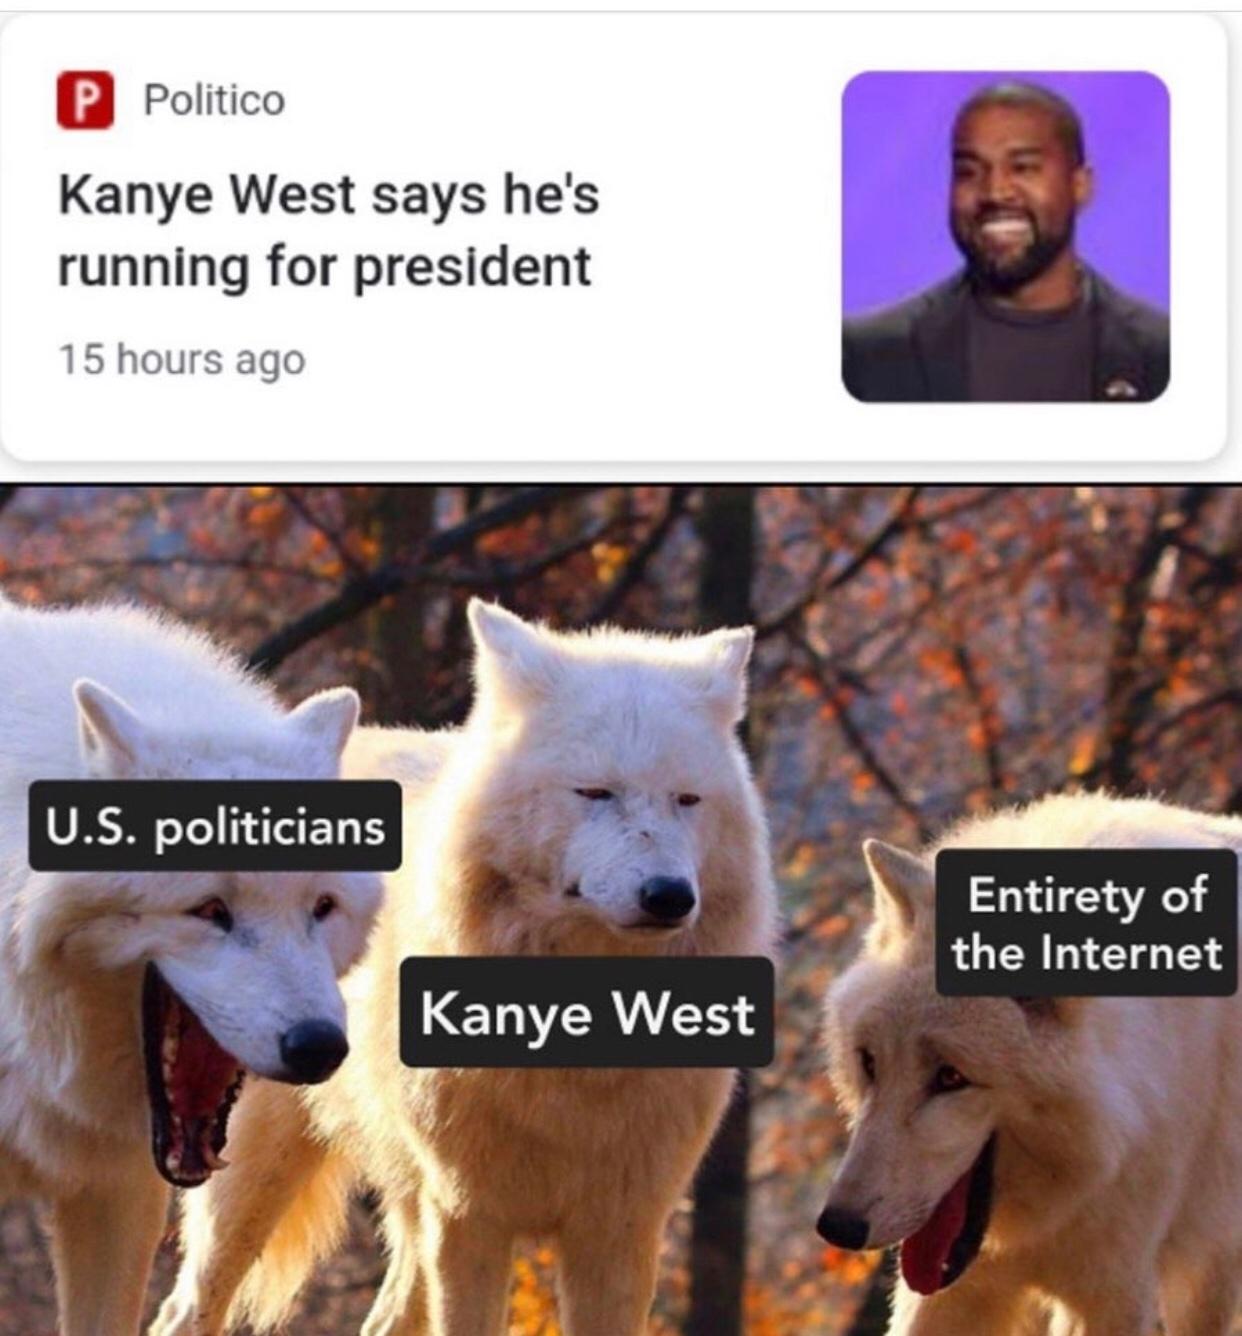 Trump 2020? - meme